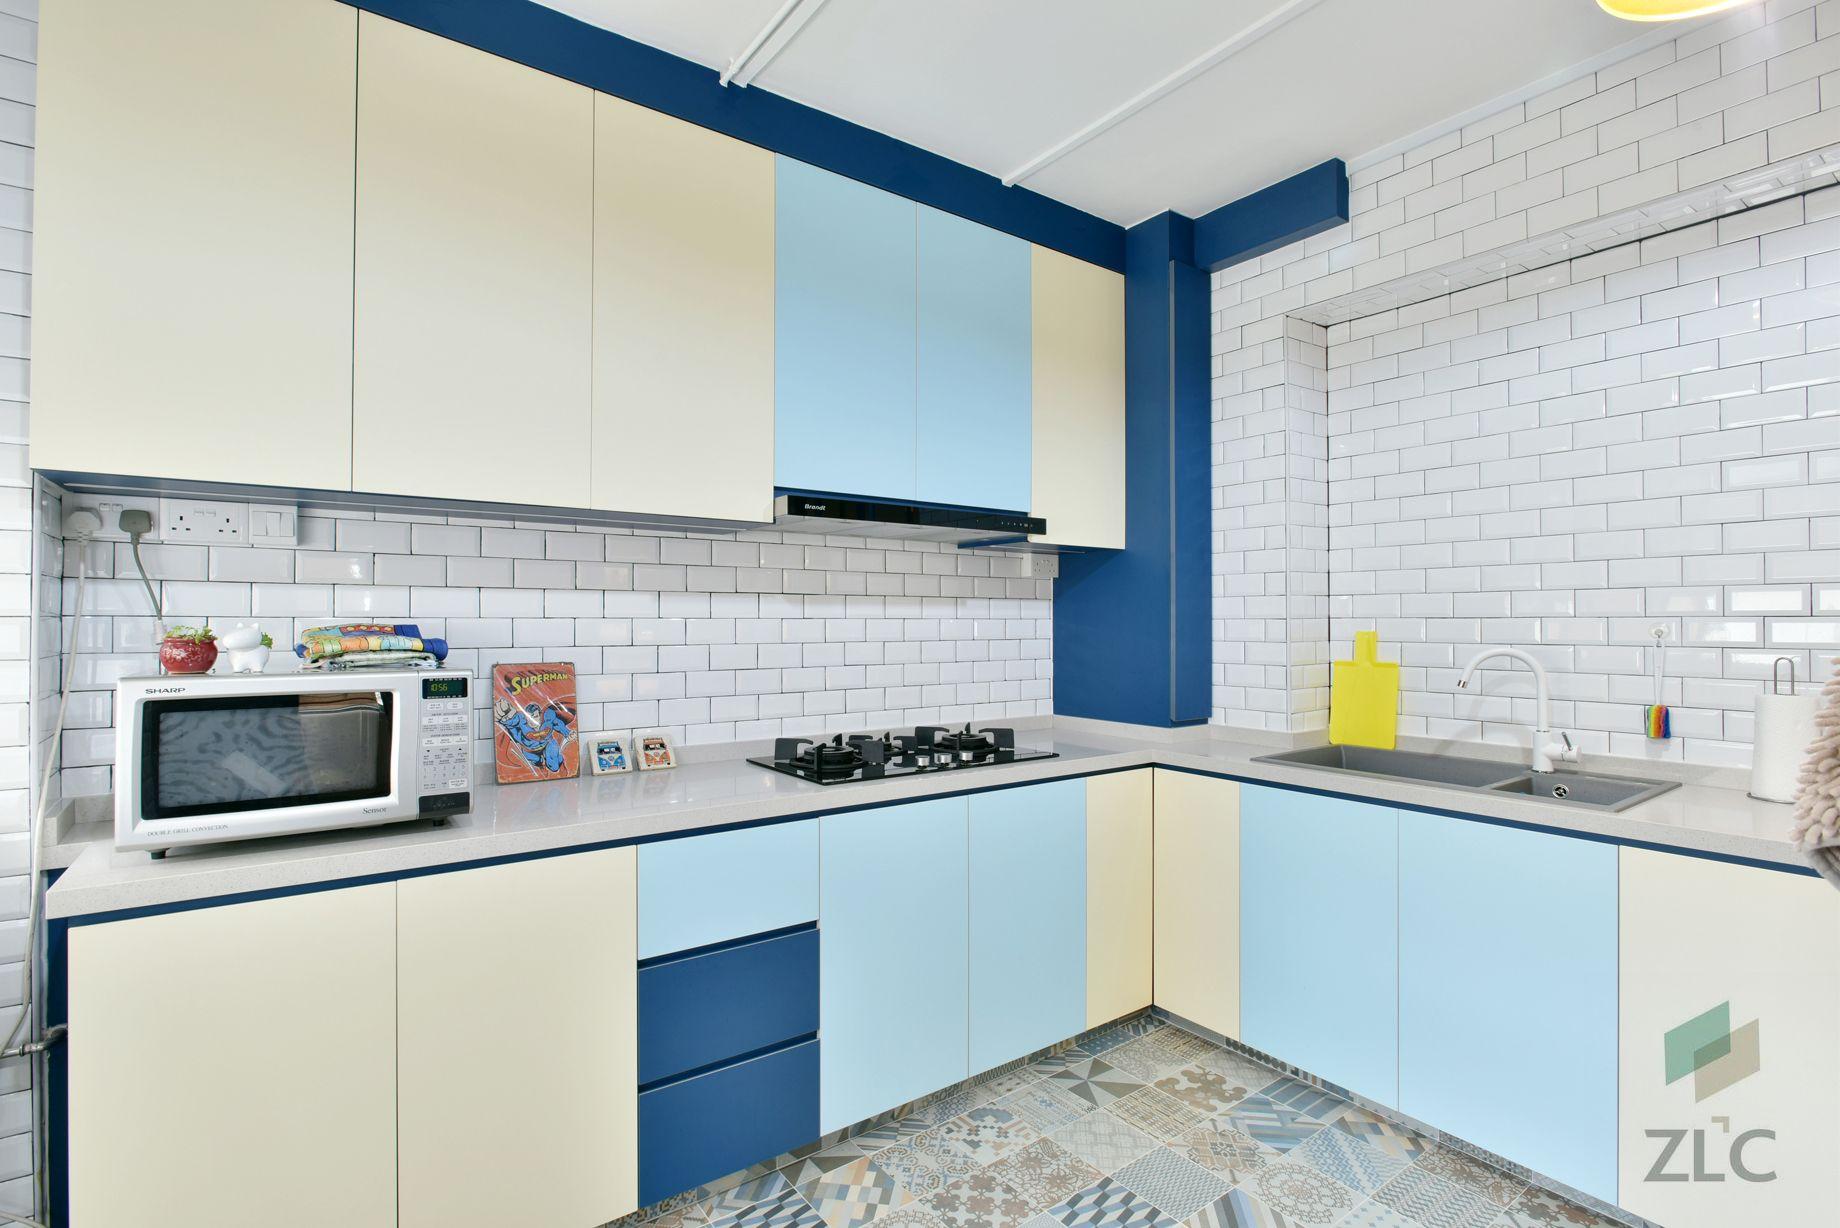 Pasir Ris Dr 4 EA HDB   Kitchen   Pinterest   Balconies, Window and ...